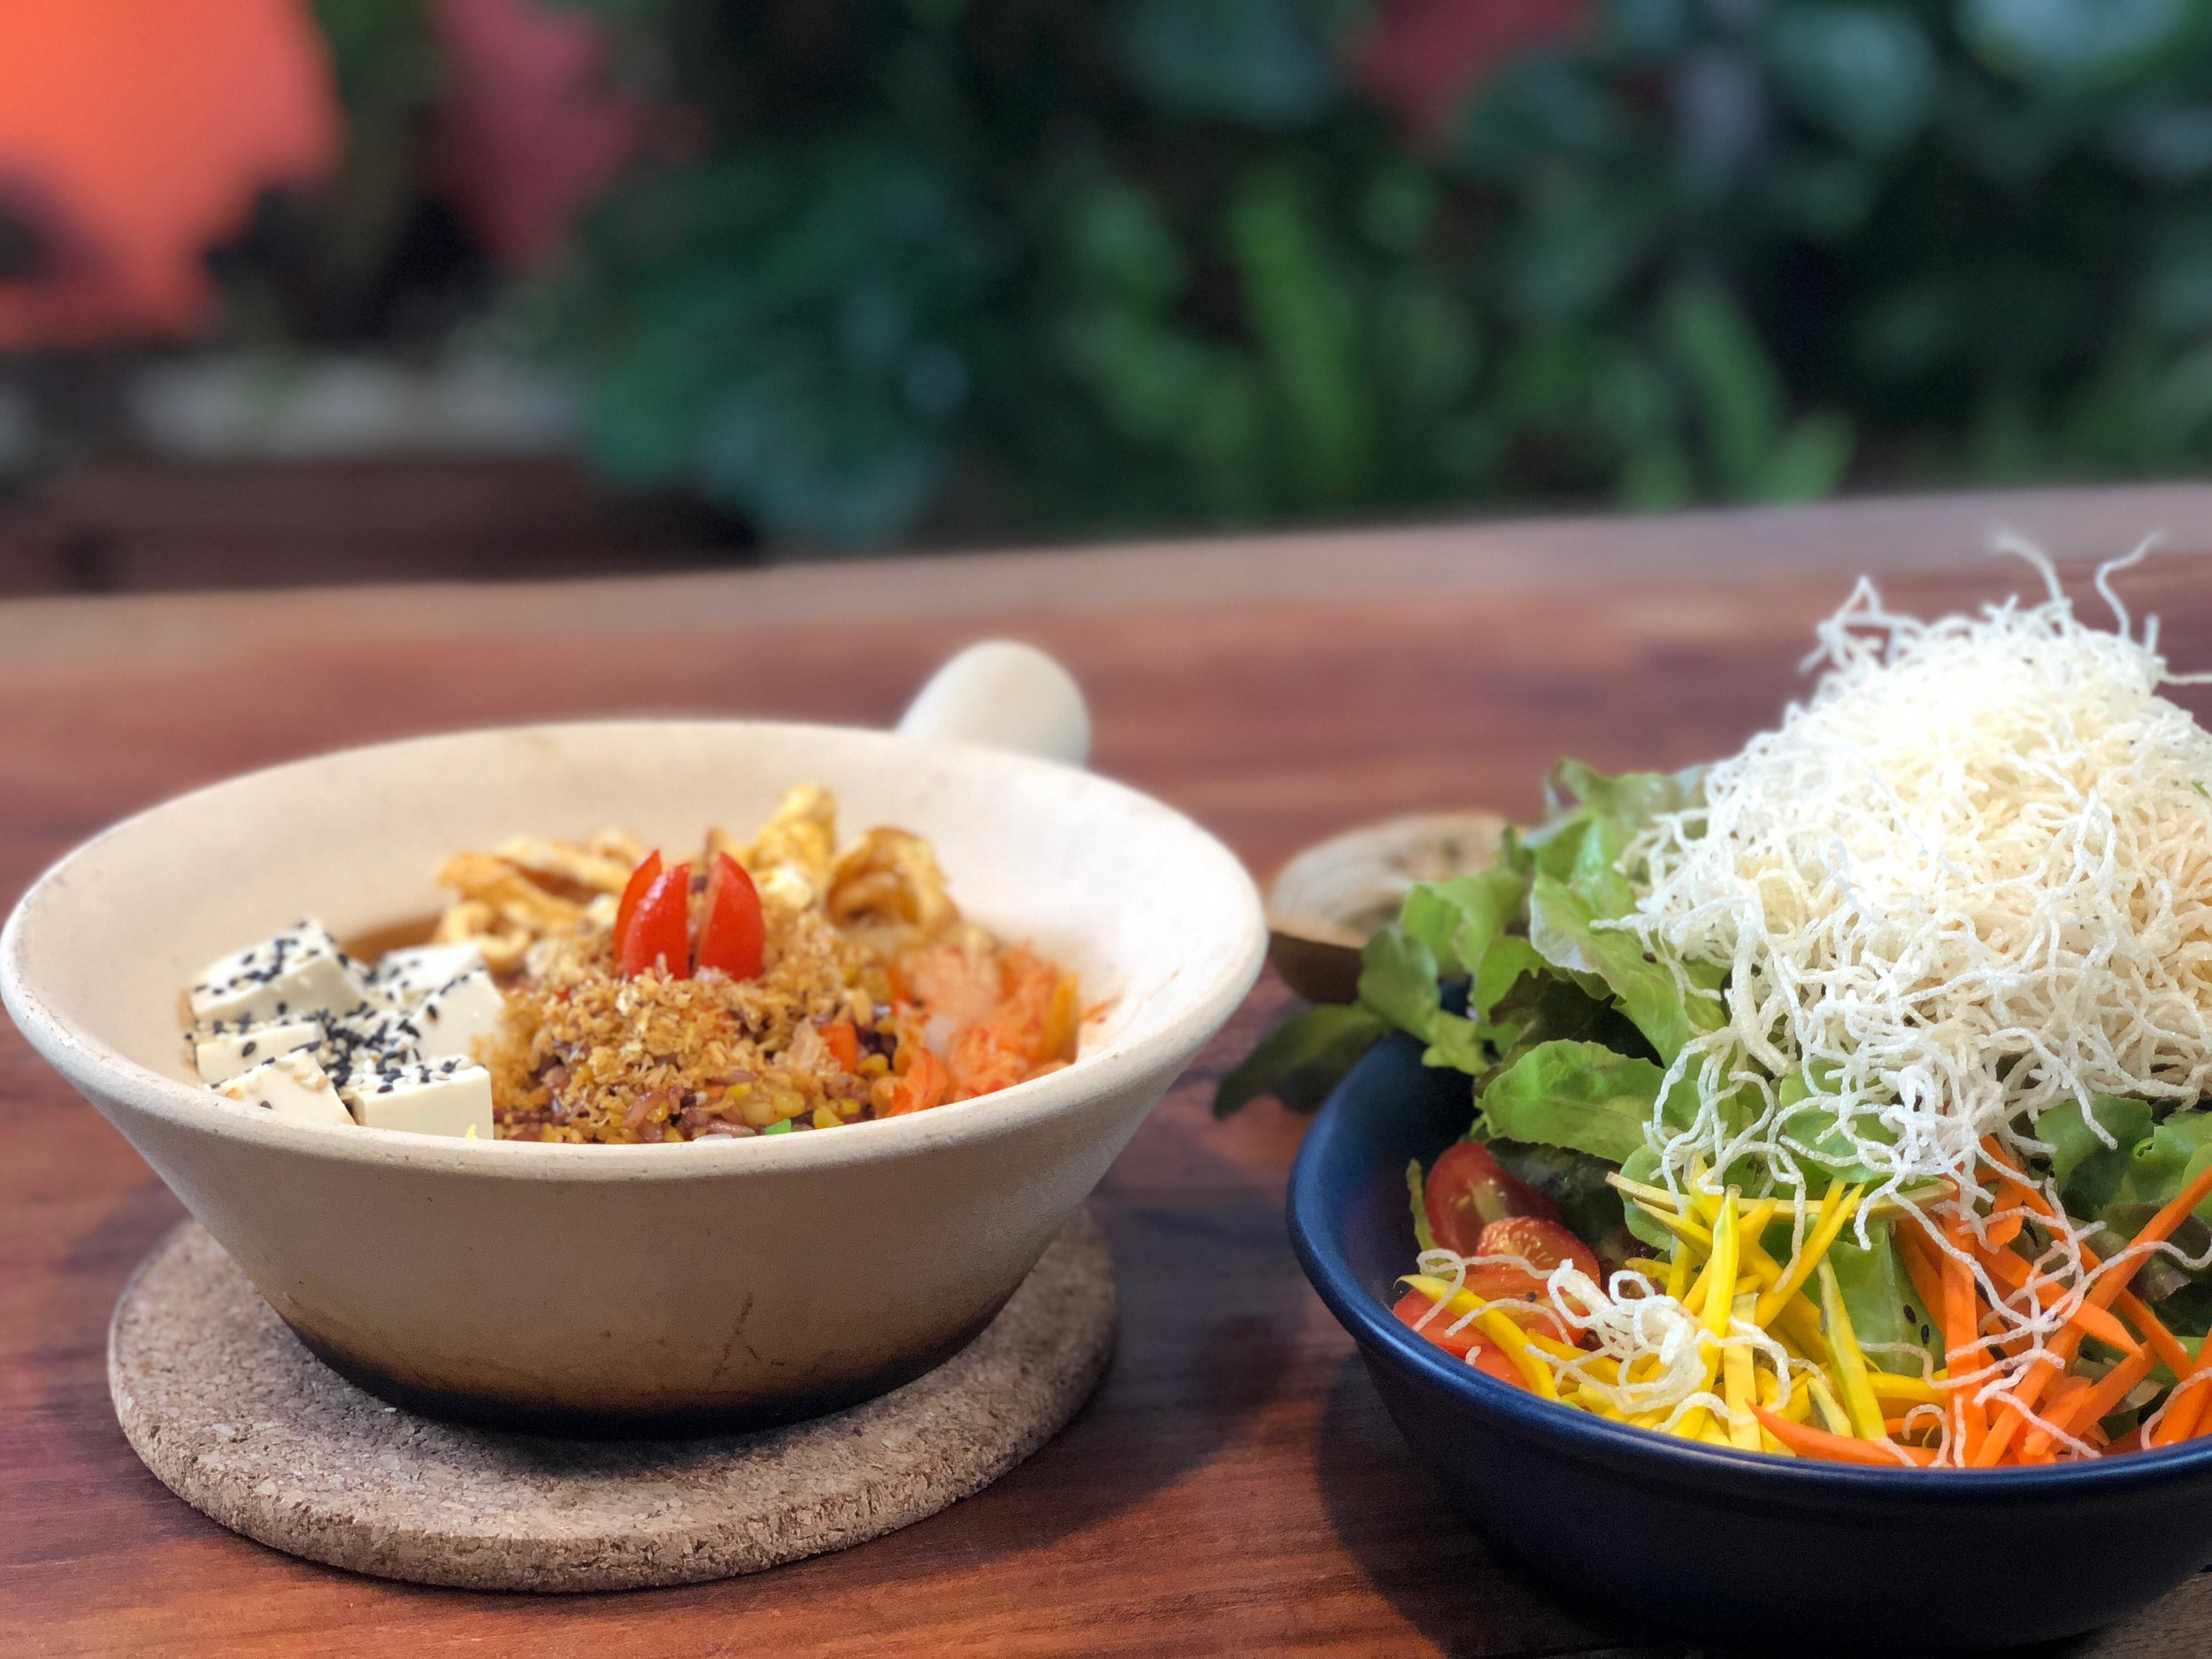 samui_health_shop_bowl_and_salad.jpg